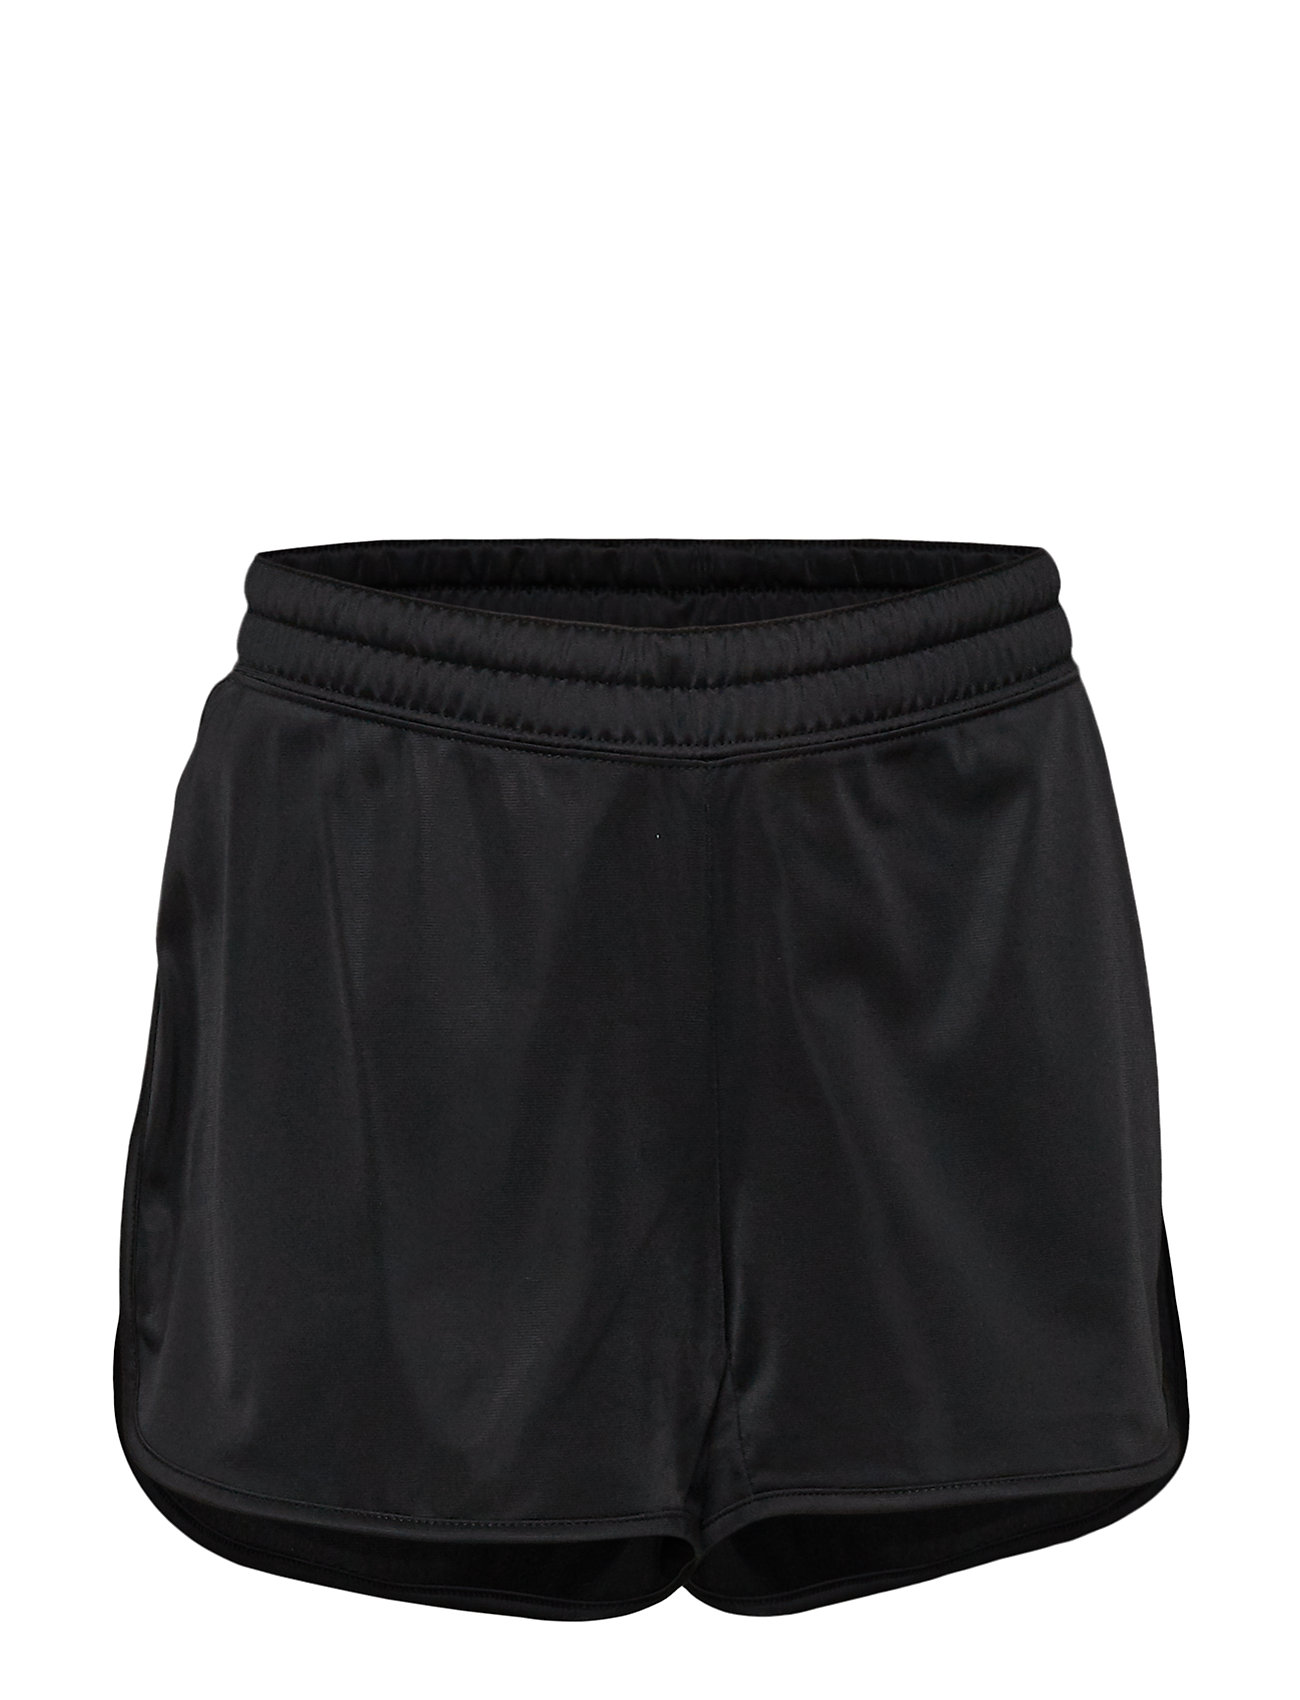 Champion Shorts - BLACK BEAUTY